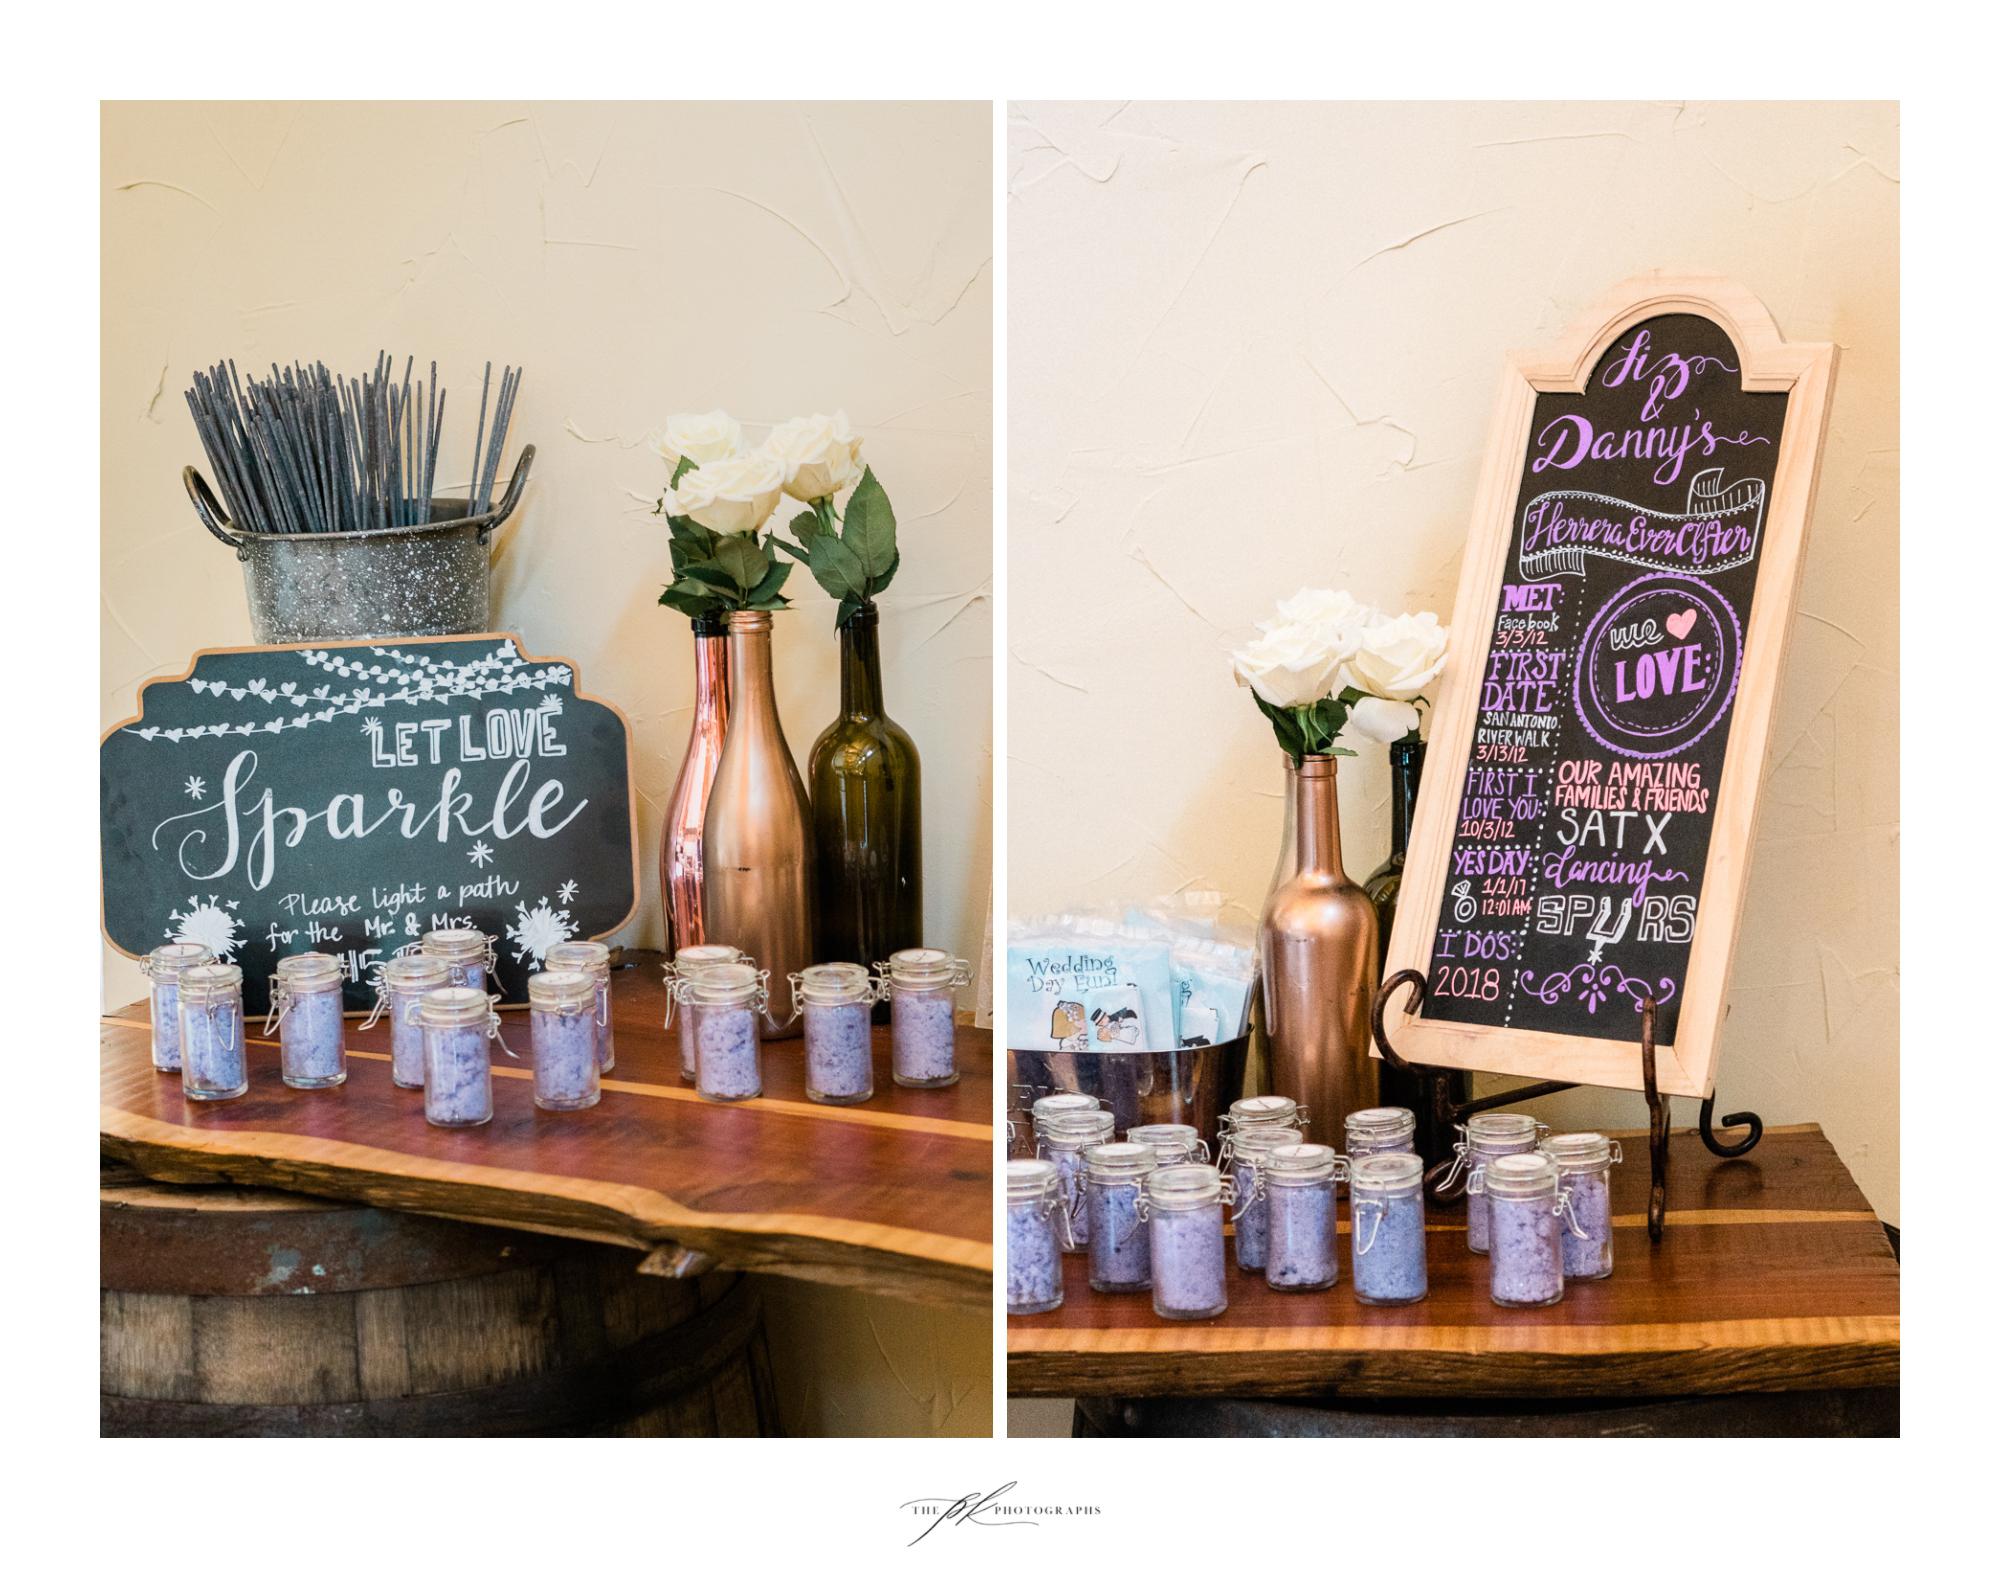 modern-country-magnolia-halle-wedding-decor-ideas-san-antonio-photographer.jpg